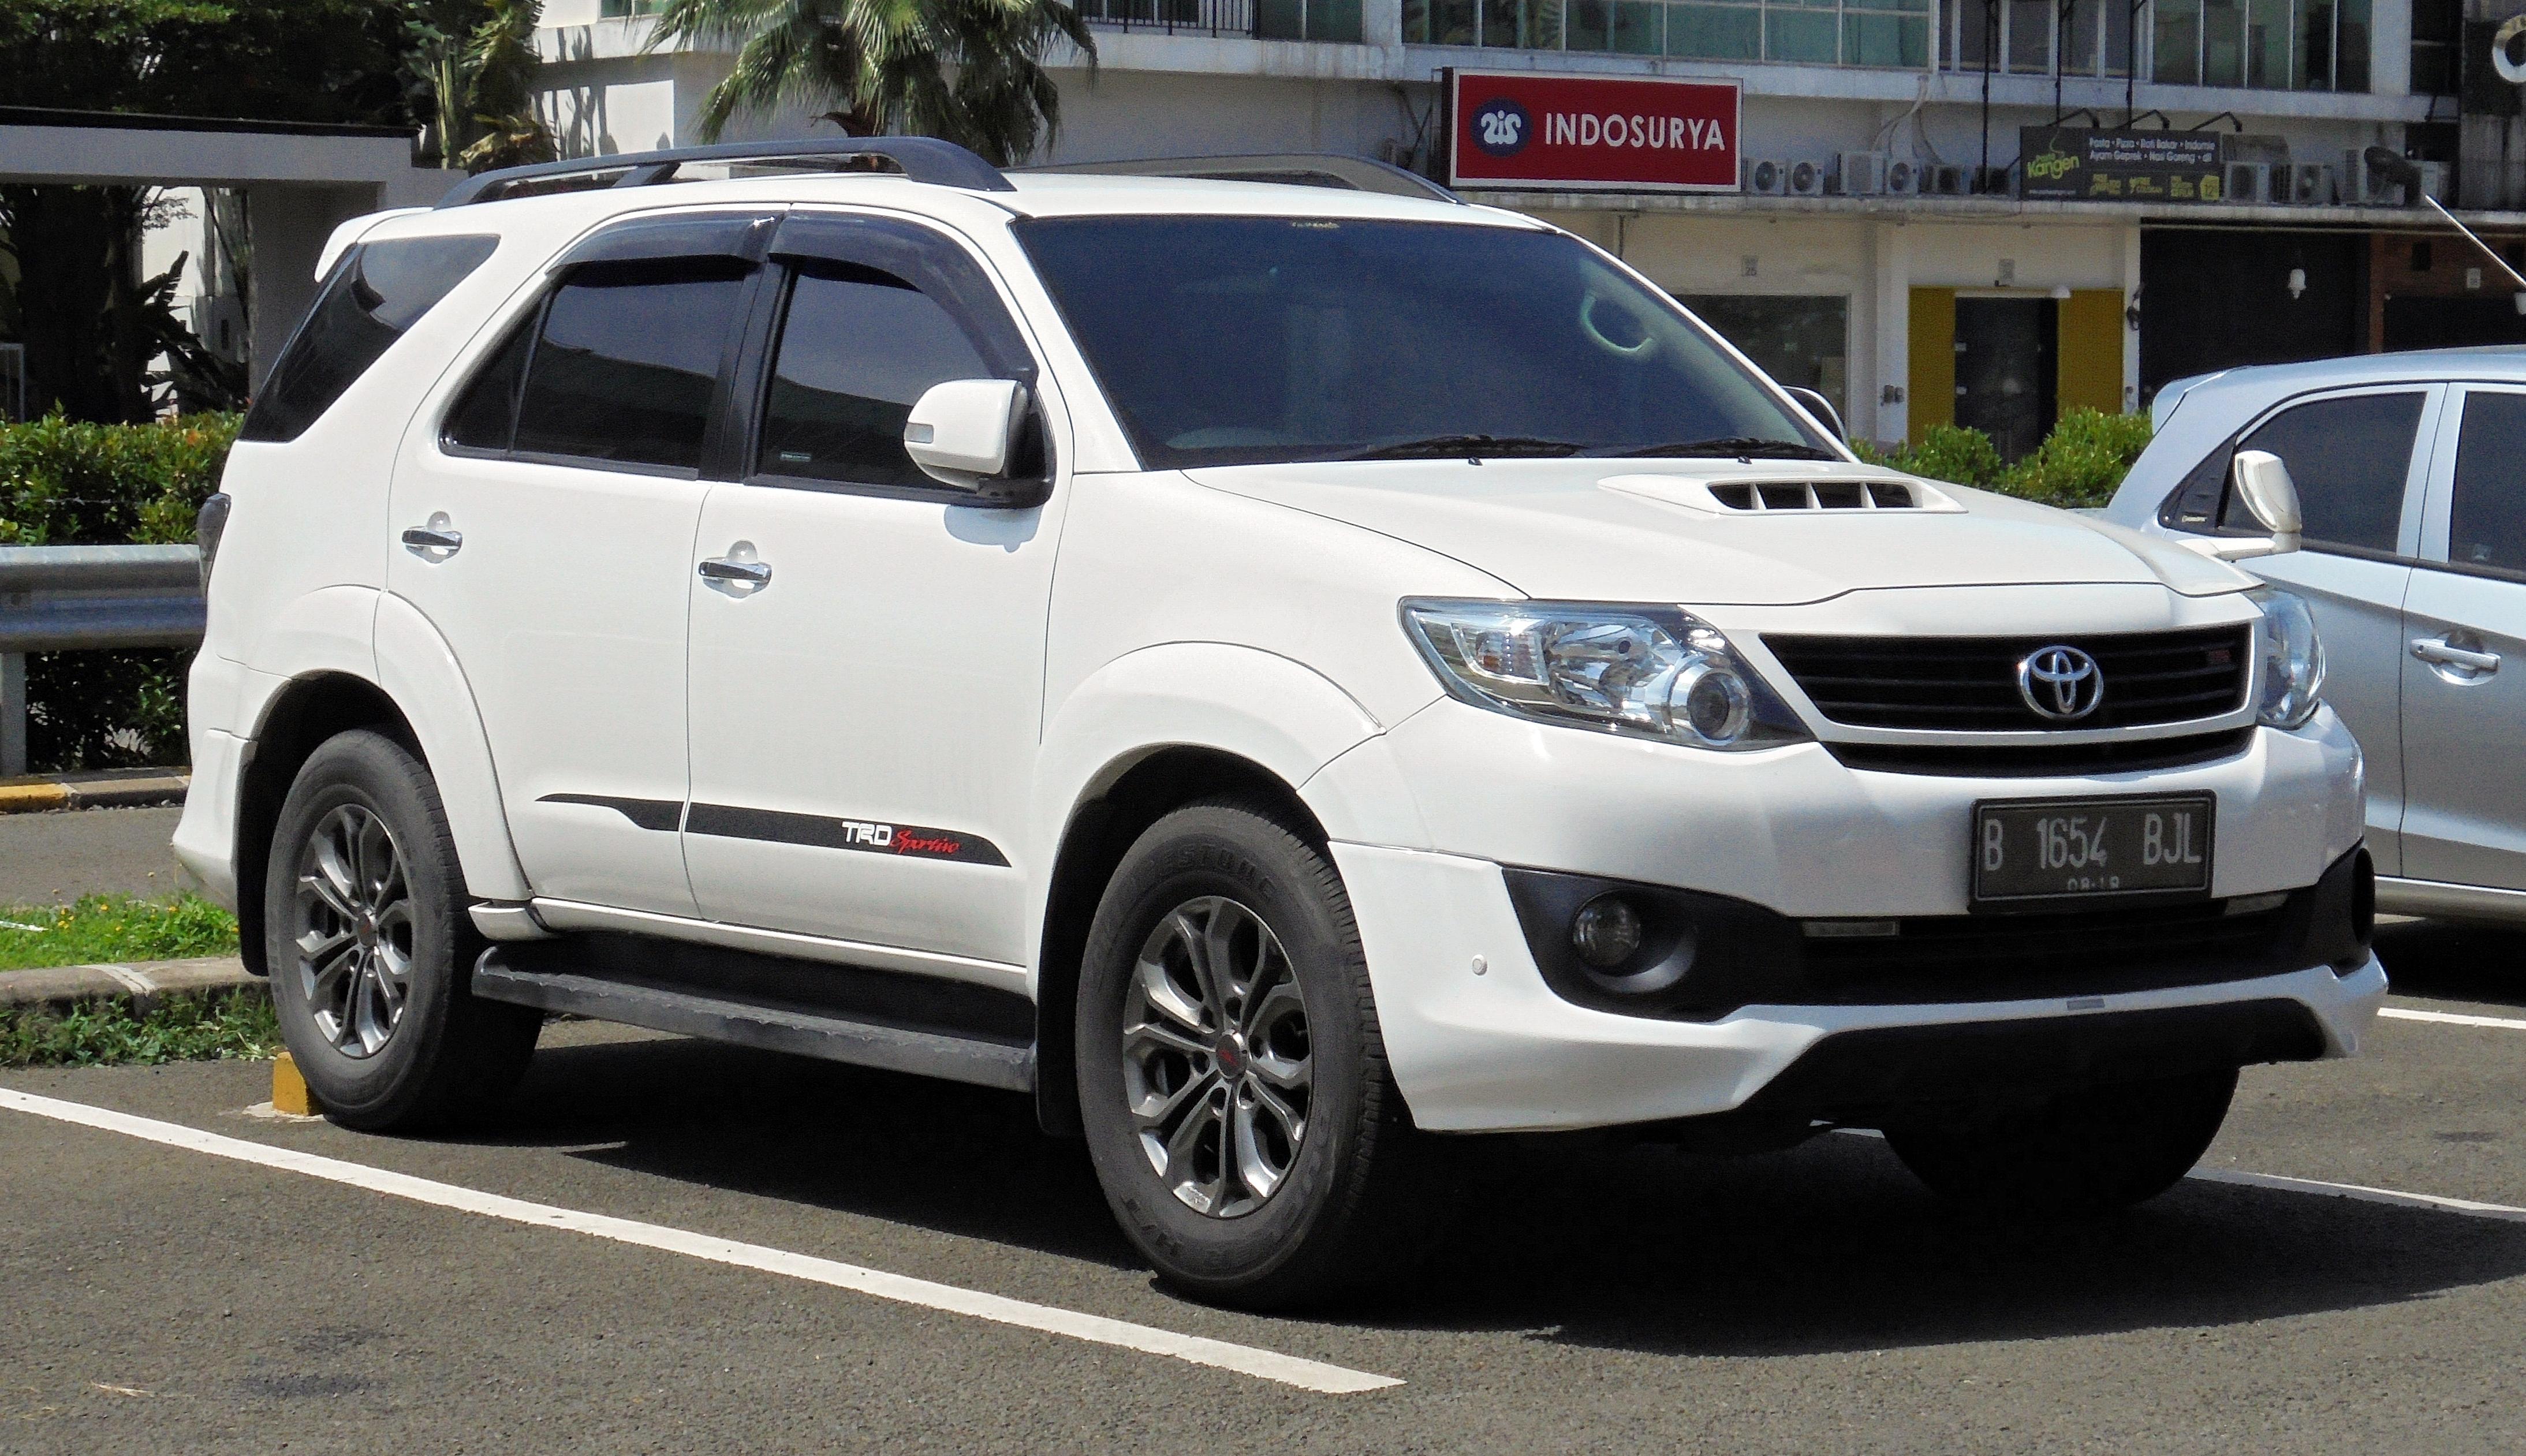 File:2014 Toyota Fortuner 2.5 G TRD Sportivo Wagon (KUN60R